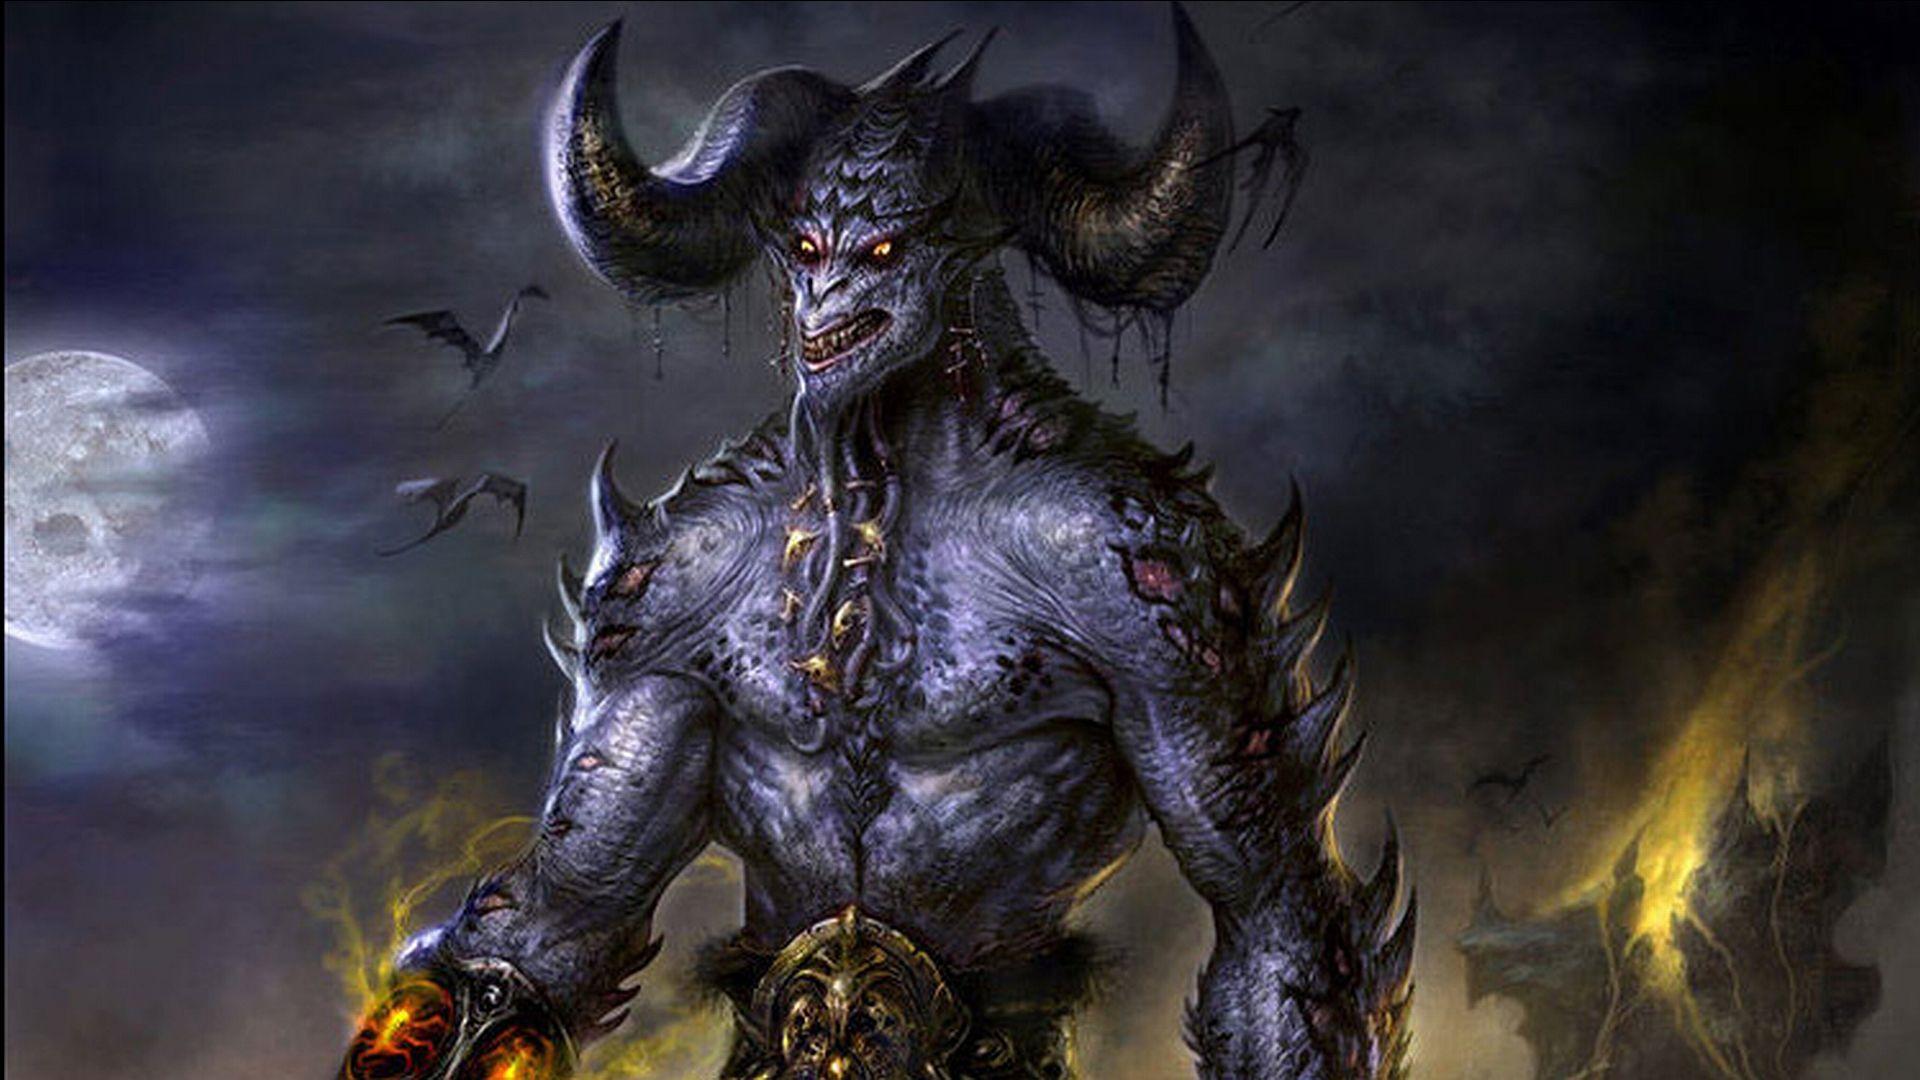 satan background hd wallpaper on mobdecor